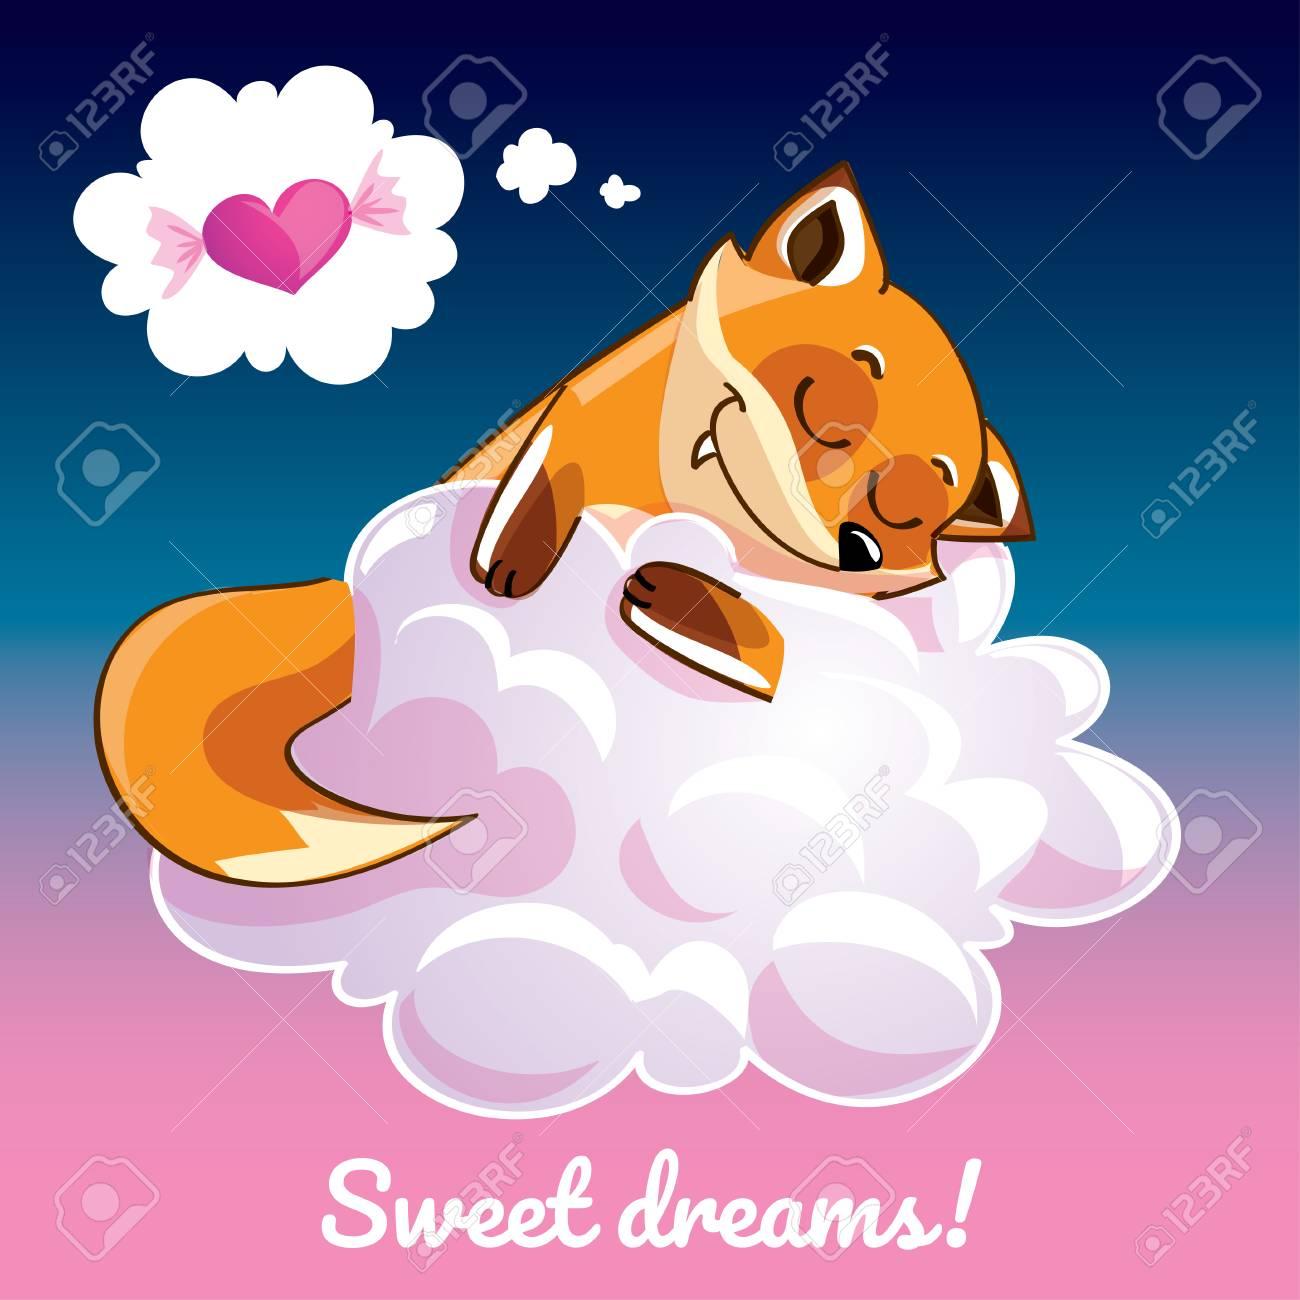 Greeting card with a cartoon fox on the cloud - 89334157